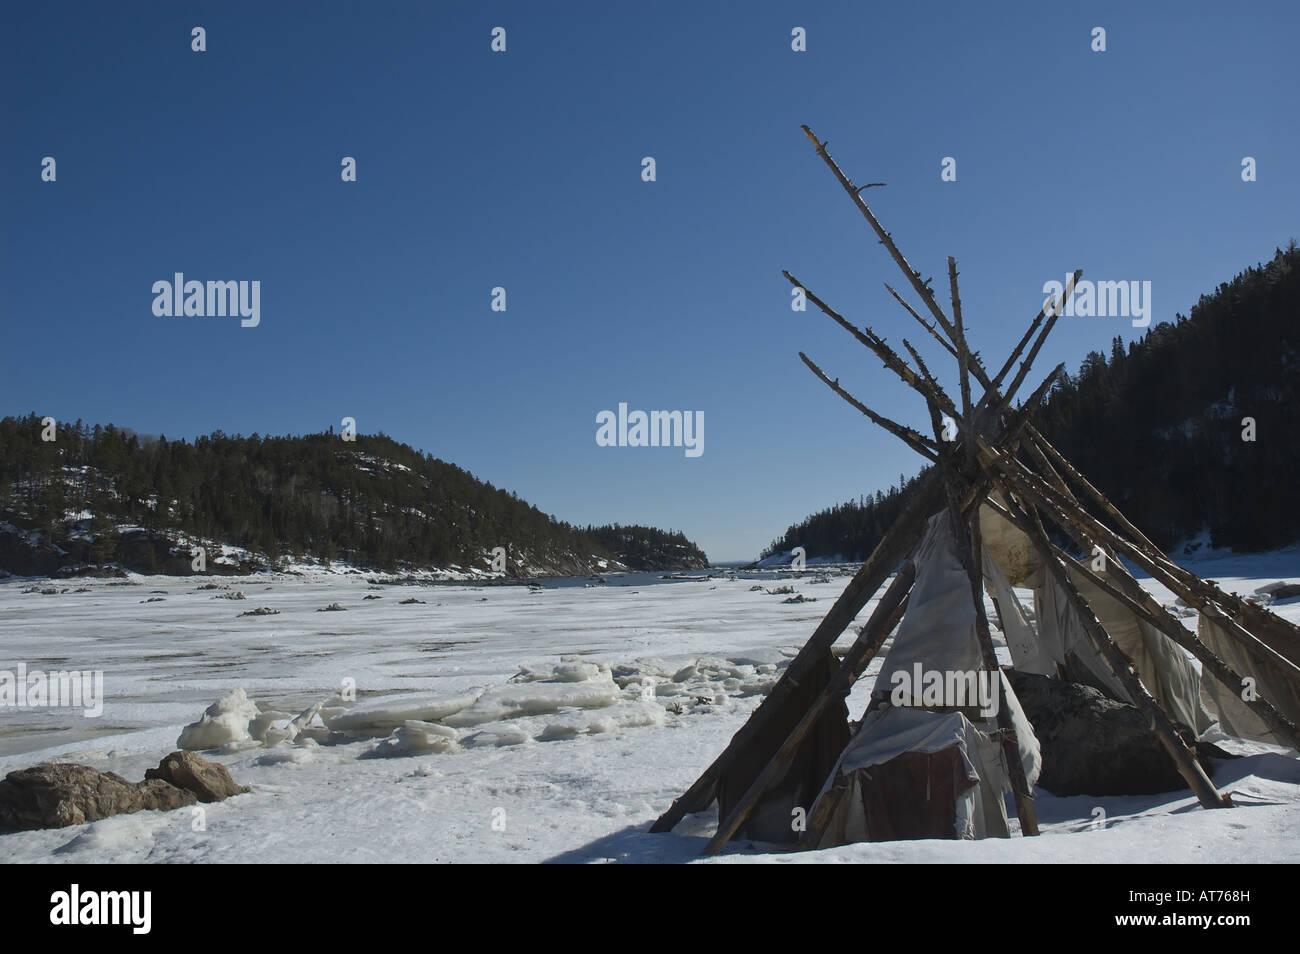 Native Amerindian tepee - Stock Image